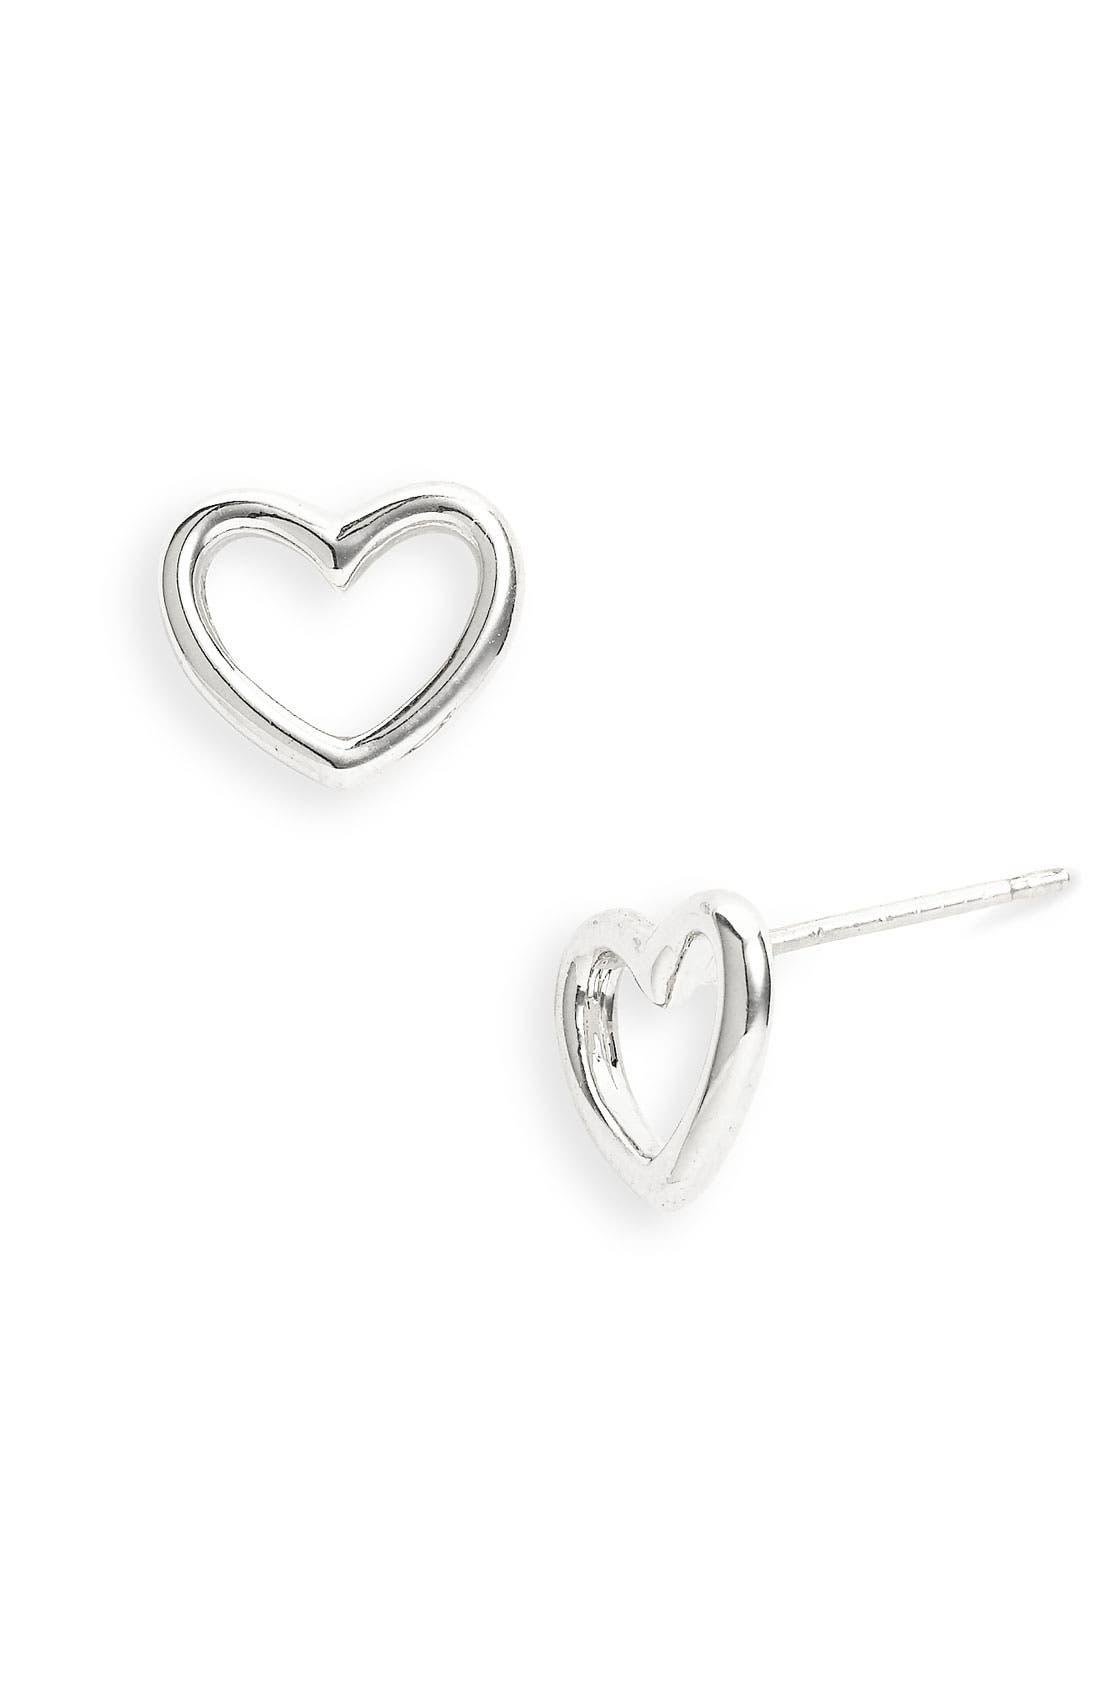 MARC BY MARC JACOBS, 'Love Edge' Heart Stud Earrings, Main thumbnail 1, color, 040